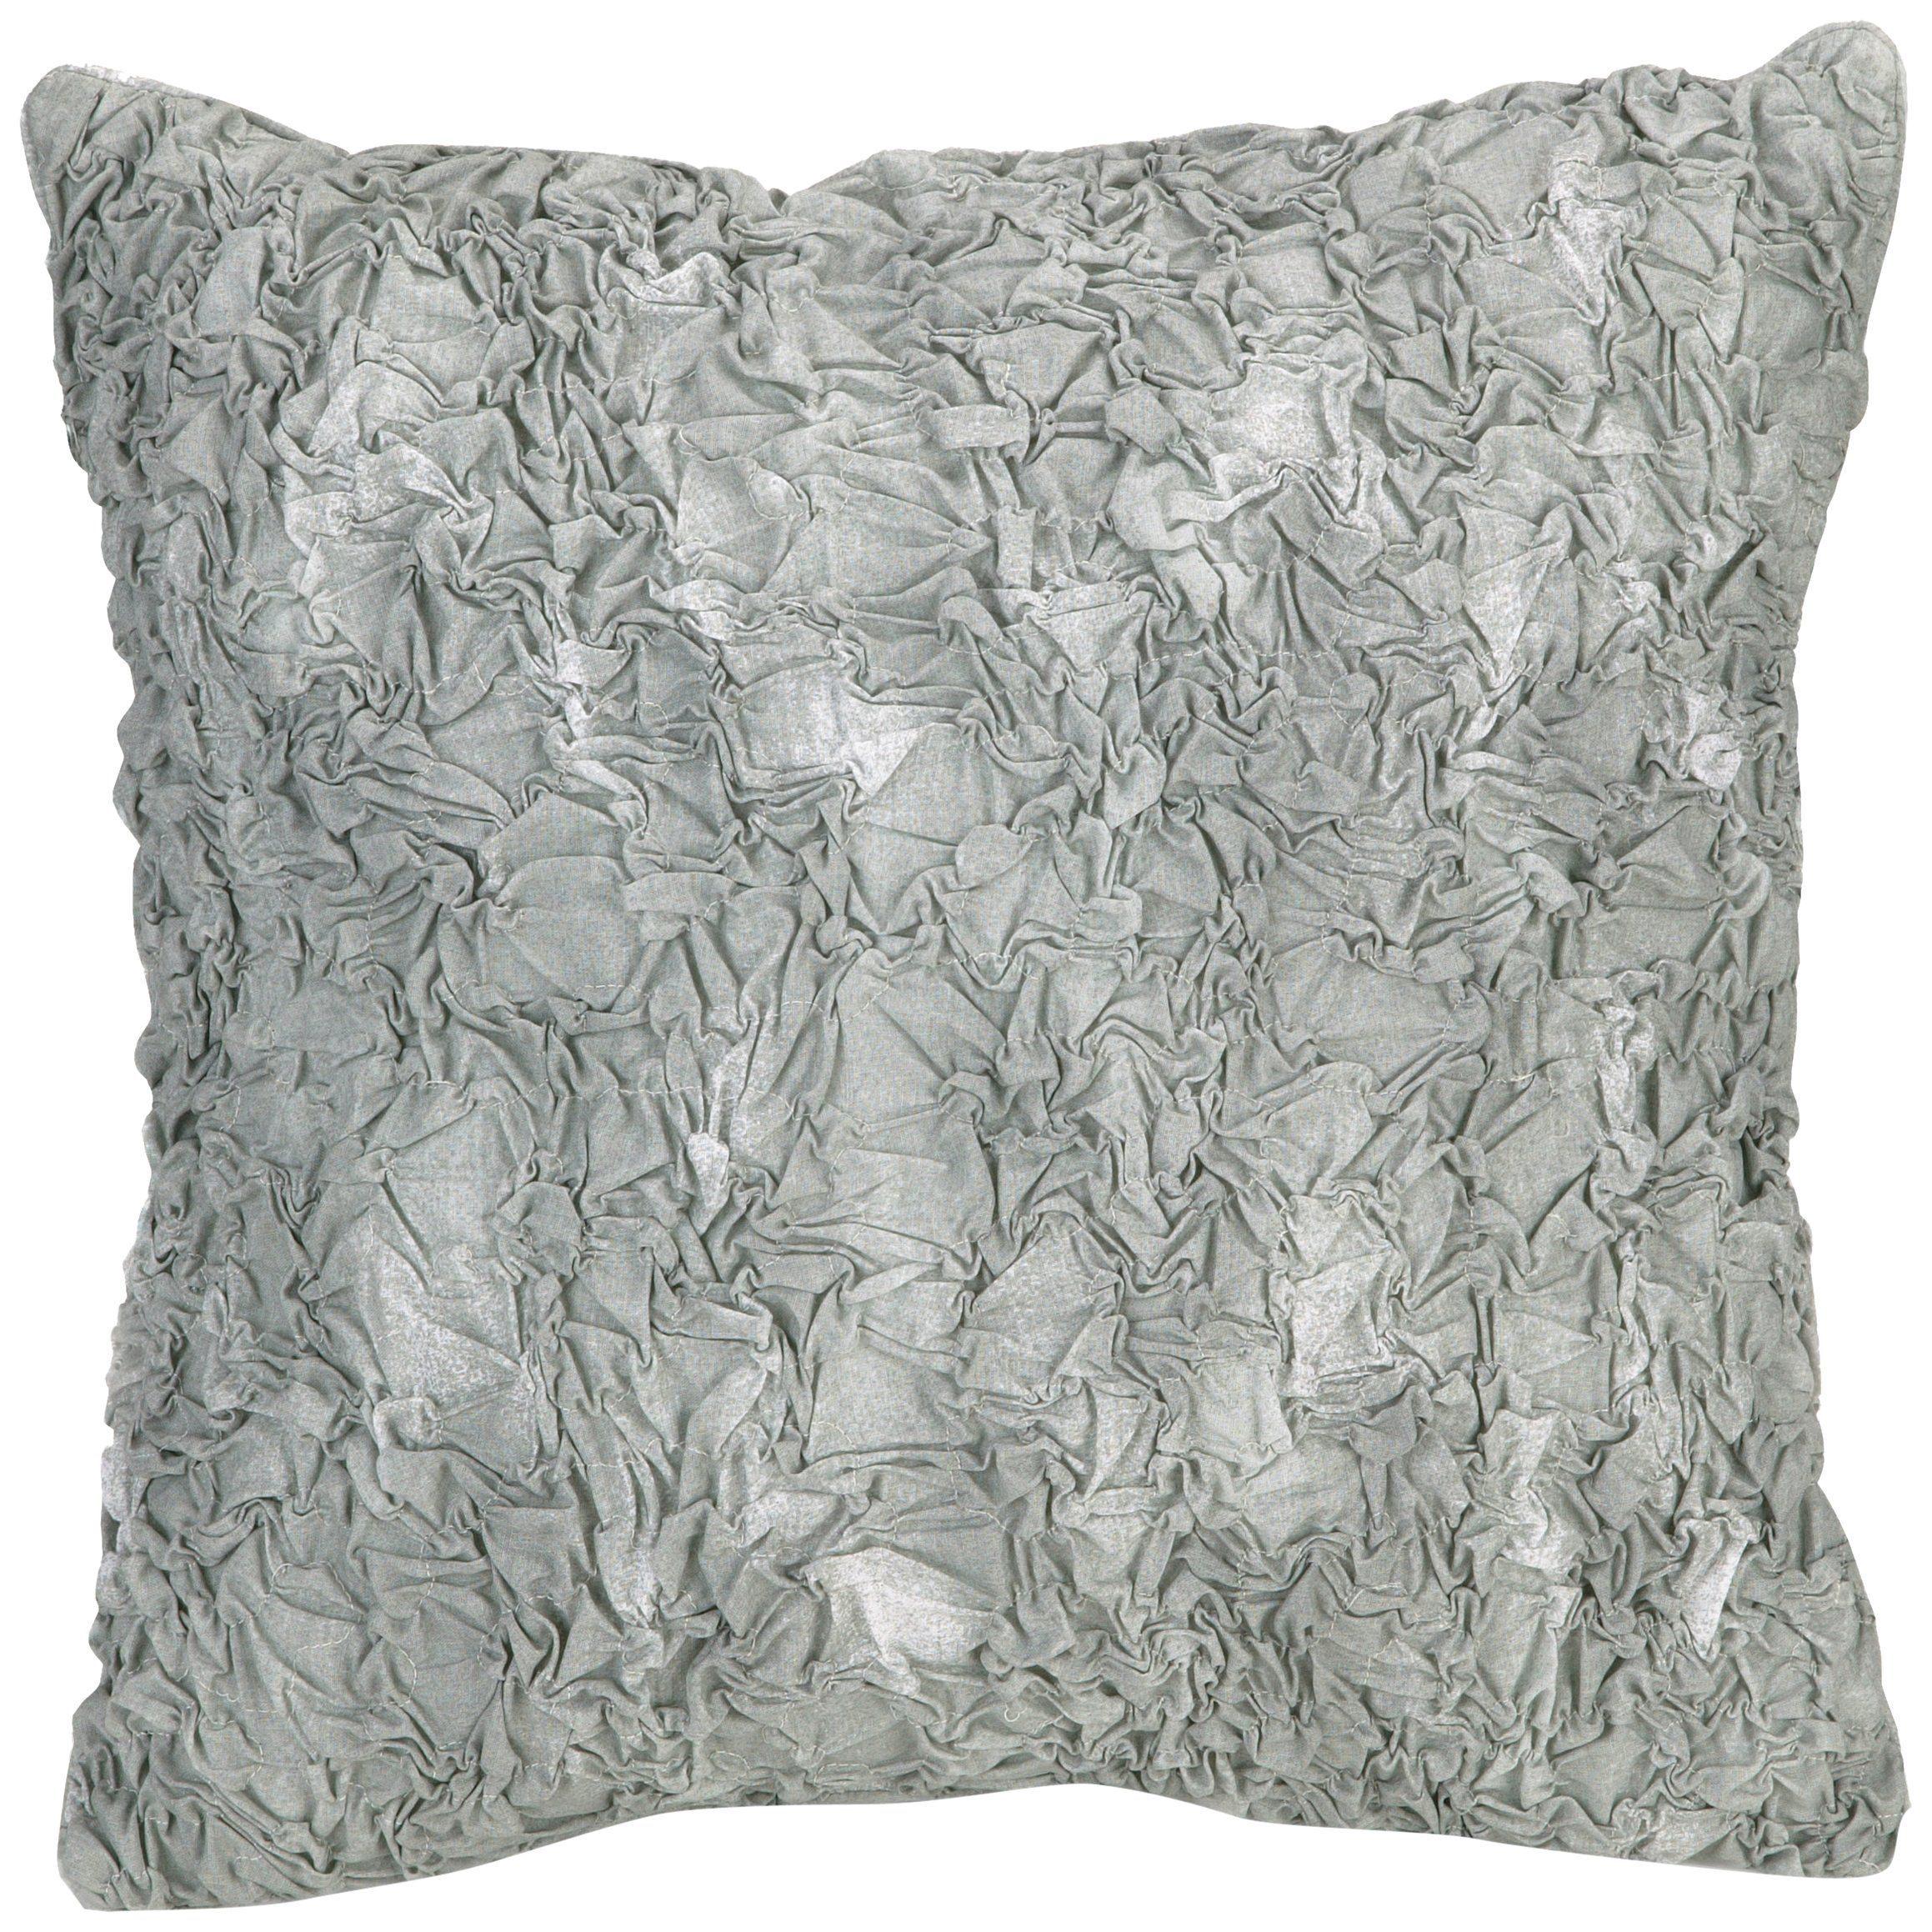 Amazon Parure De Lit Charmant Amazon Jessica Simpson Golden Peony Textured Decorative Pillow